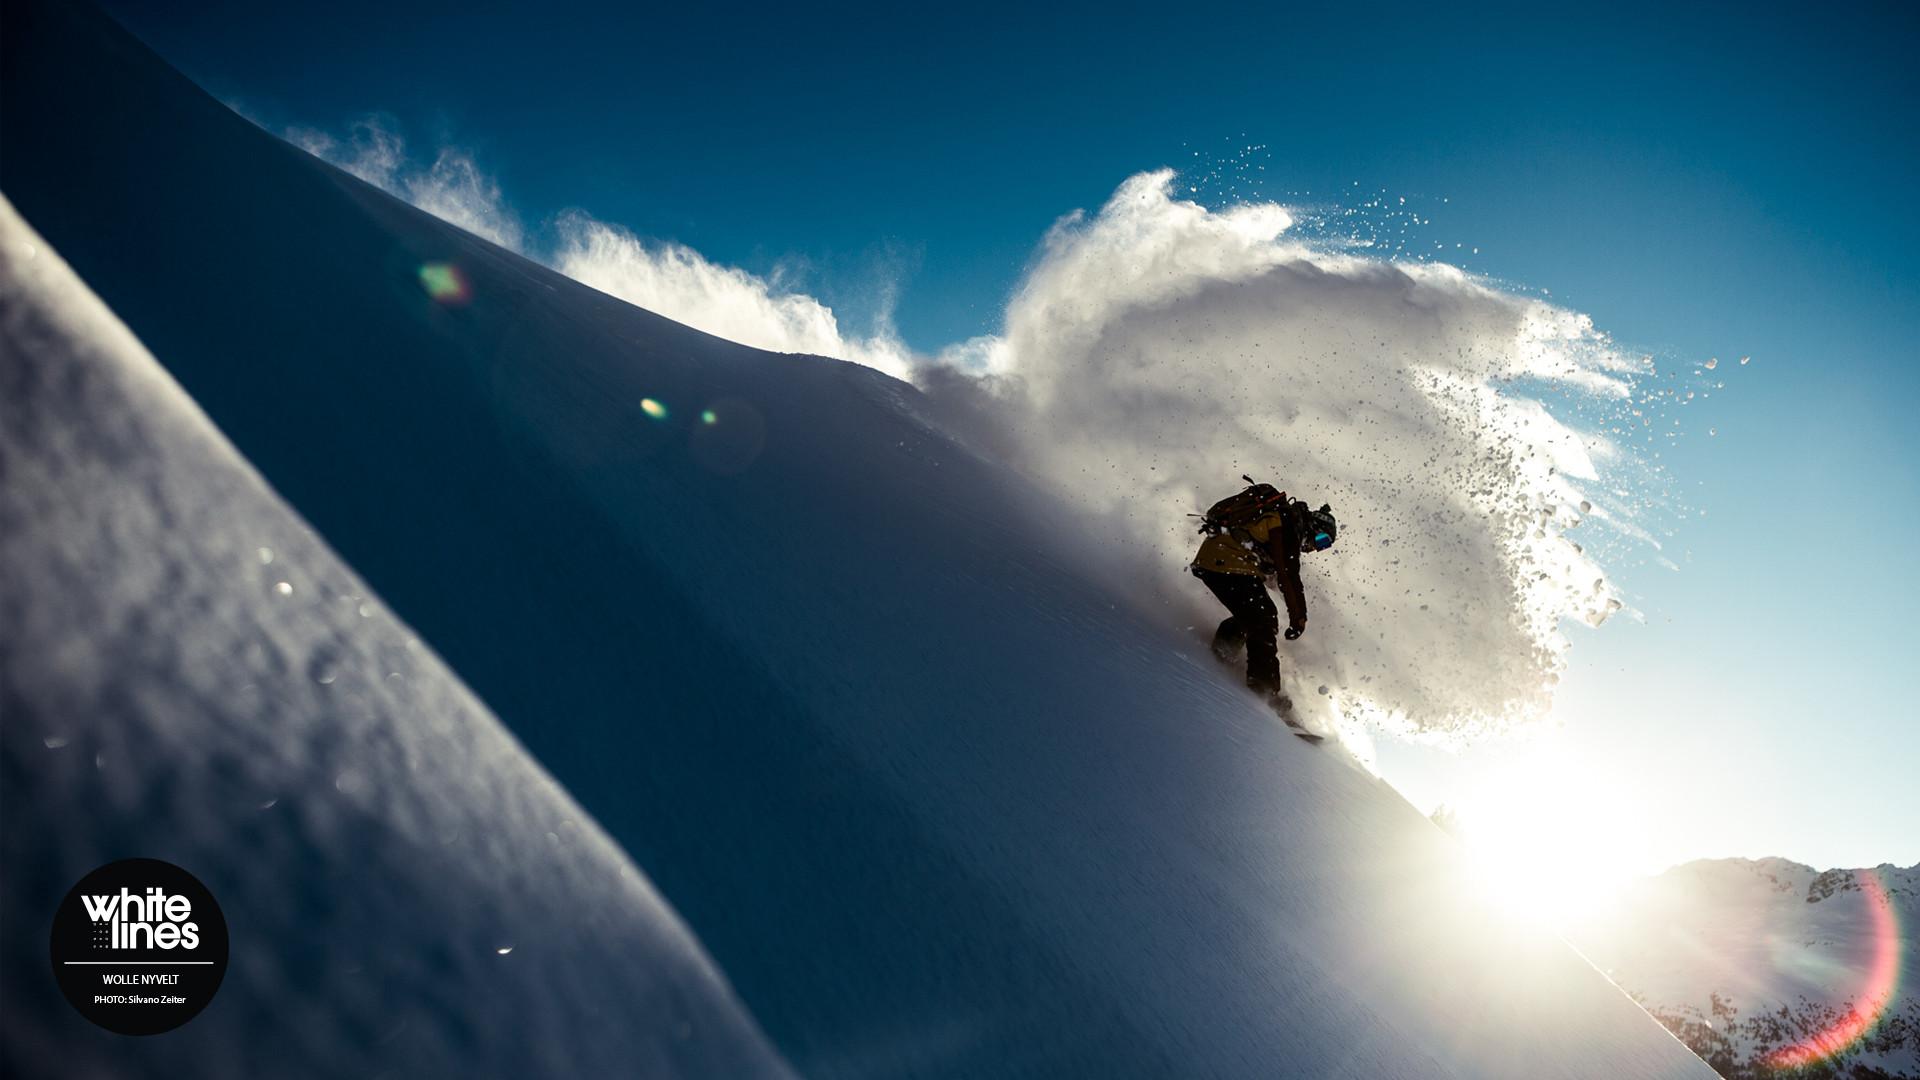 картинки сноубордистов на рабочий стол